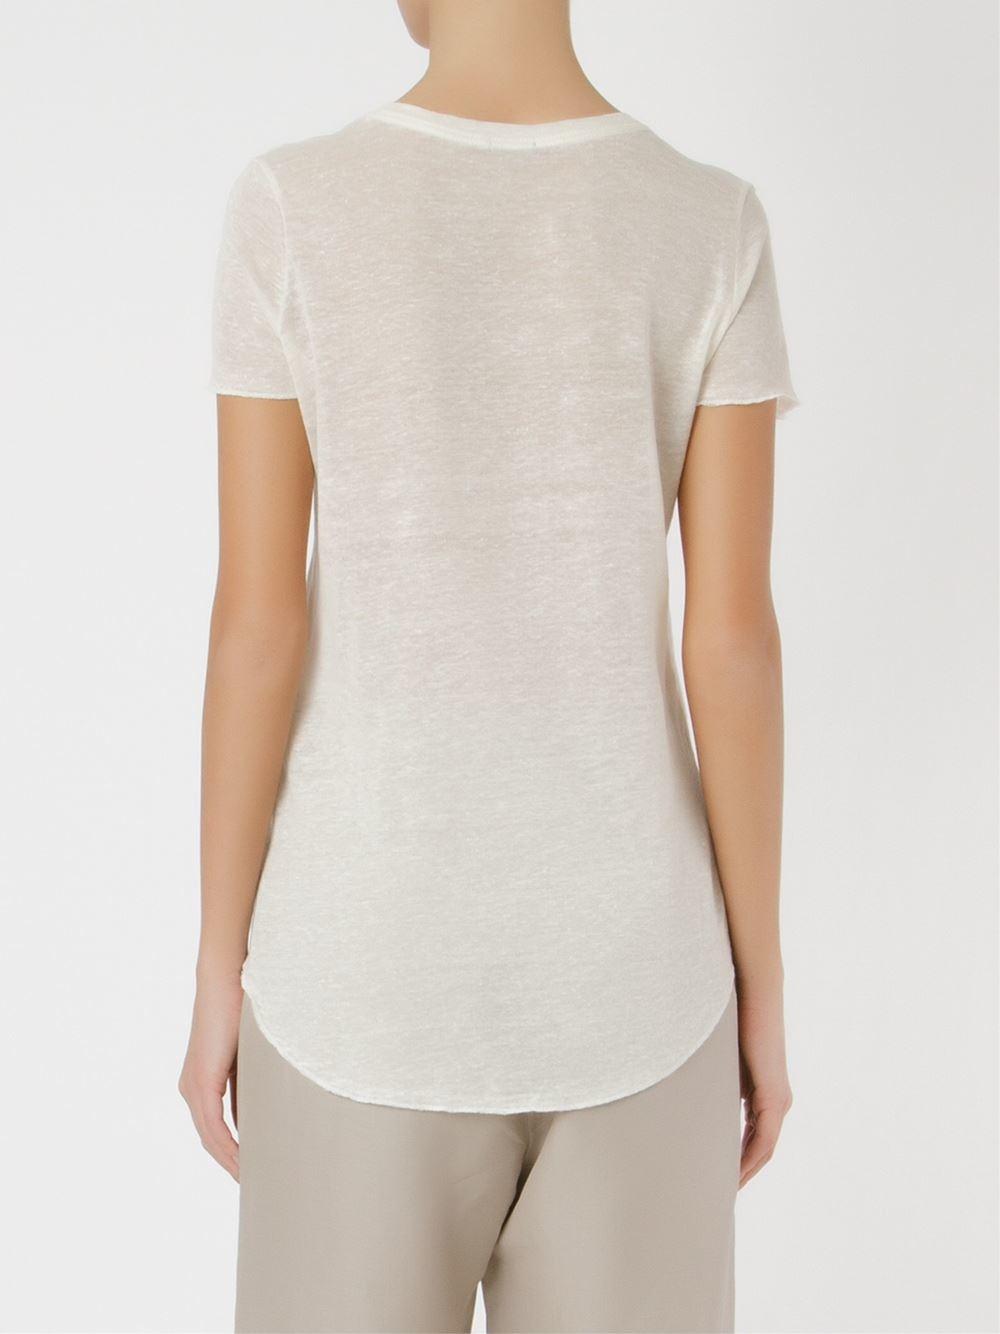 Osklen Front Print T Shirt In White Lyst